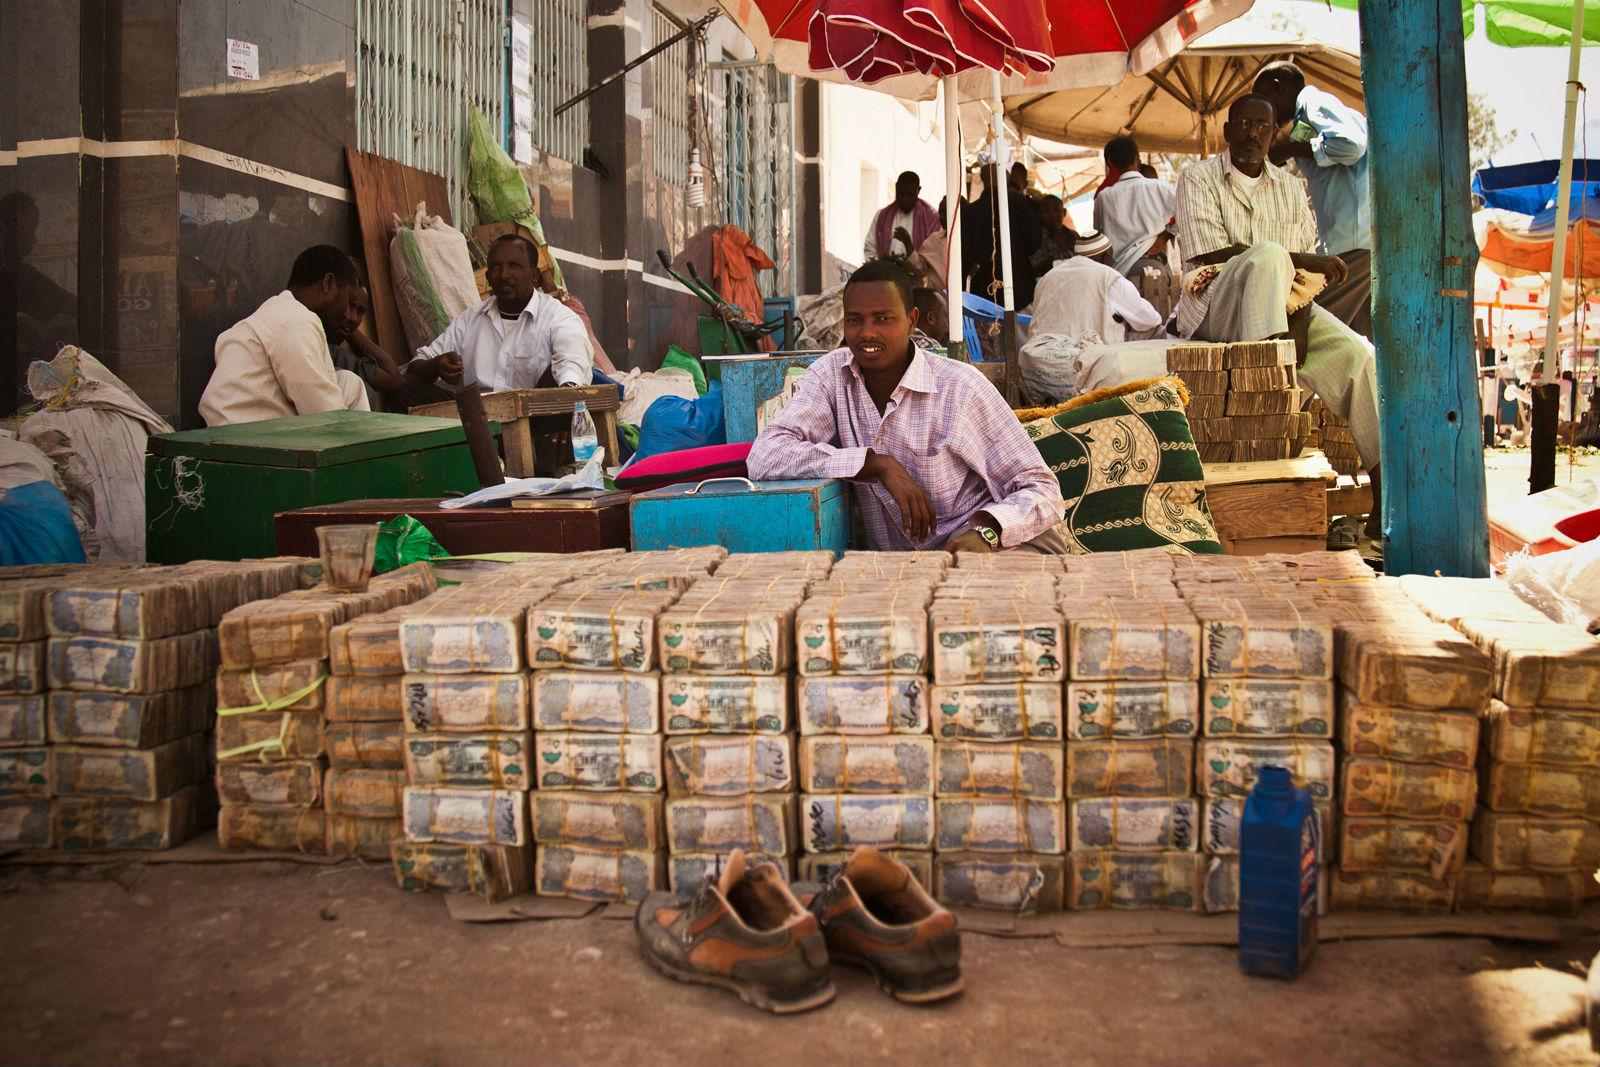 Moneychangers, Hargeisa, Somaliland